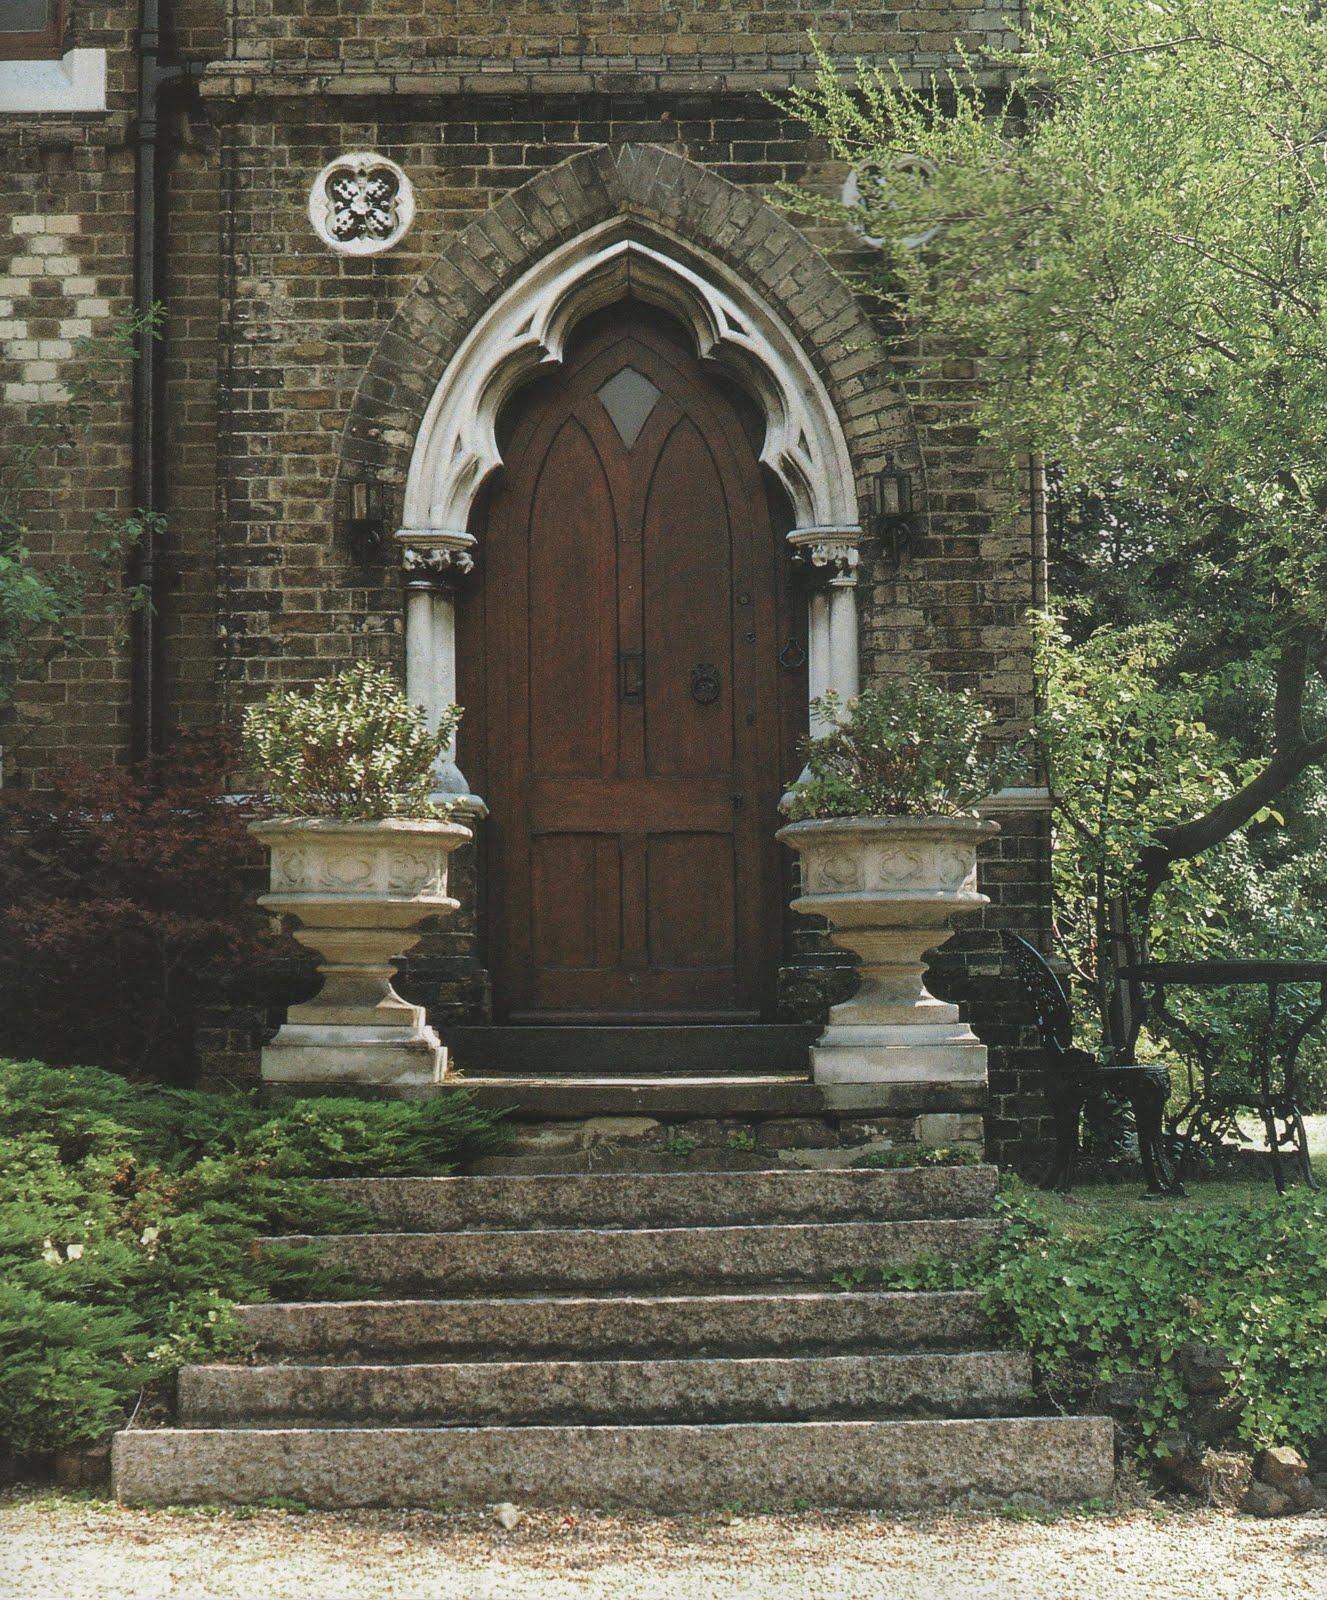 Victorian Literature: A Victorian House